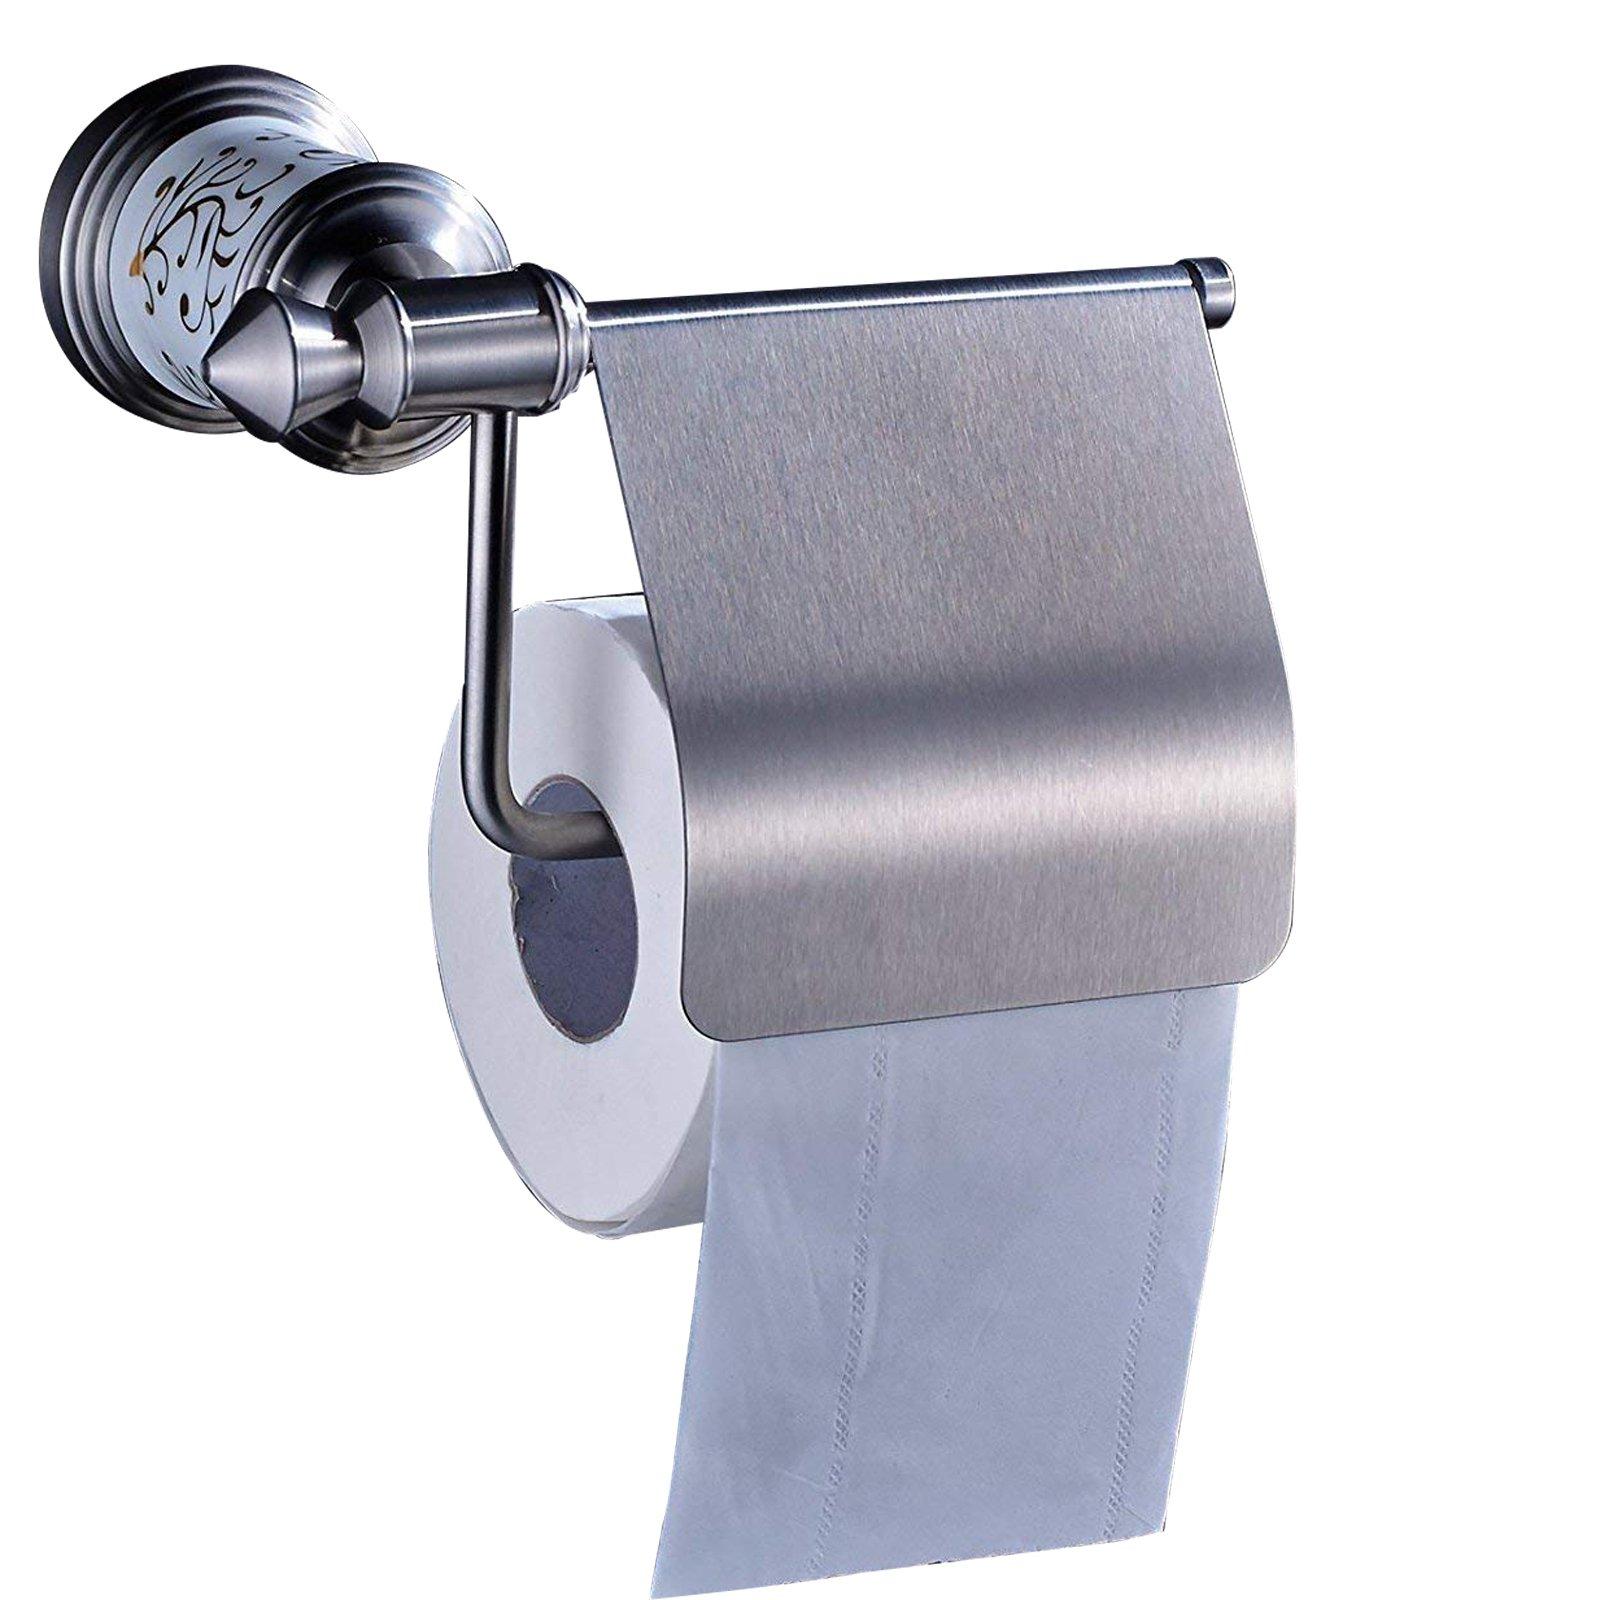 Votamuta New Toilet Paper Holder Storage Bathroom Kitchen Paper Towel Dispenser Tissue Roll Hanger Wall Mount, Stainless Steel Brushed Nickel